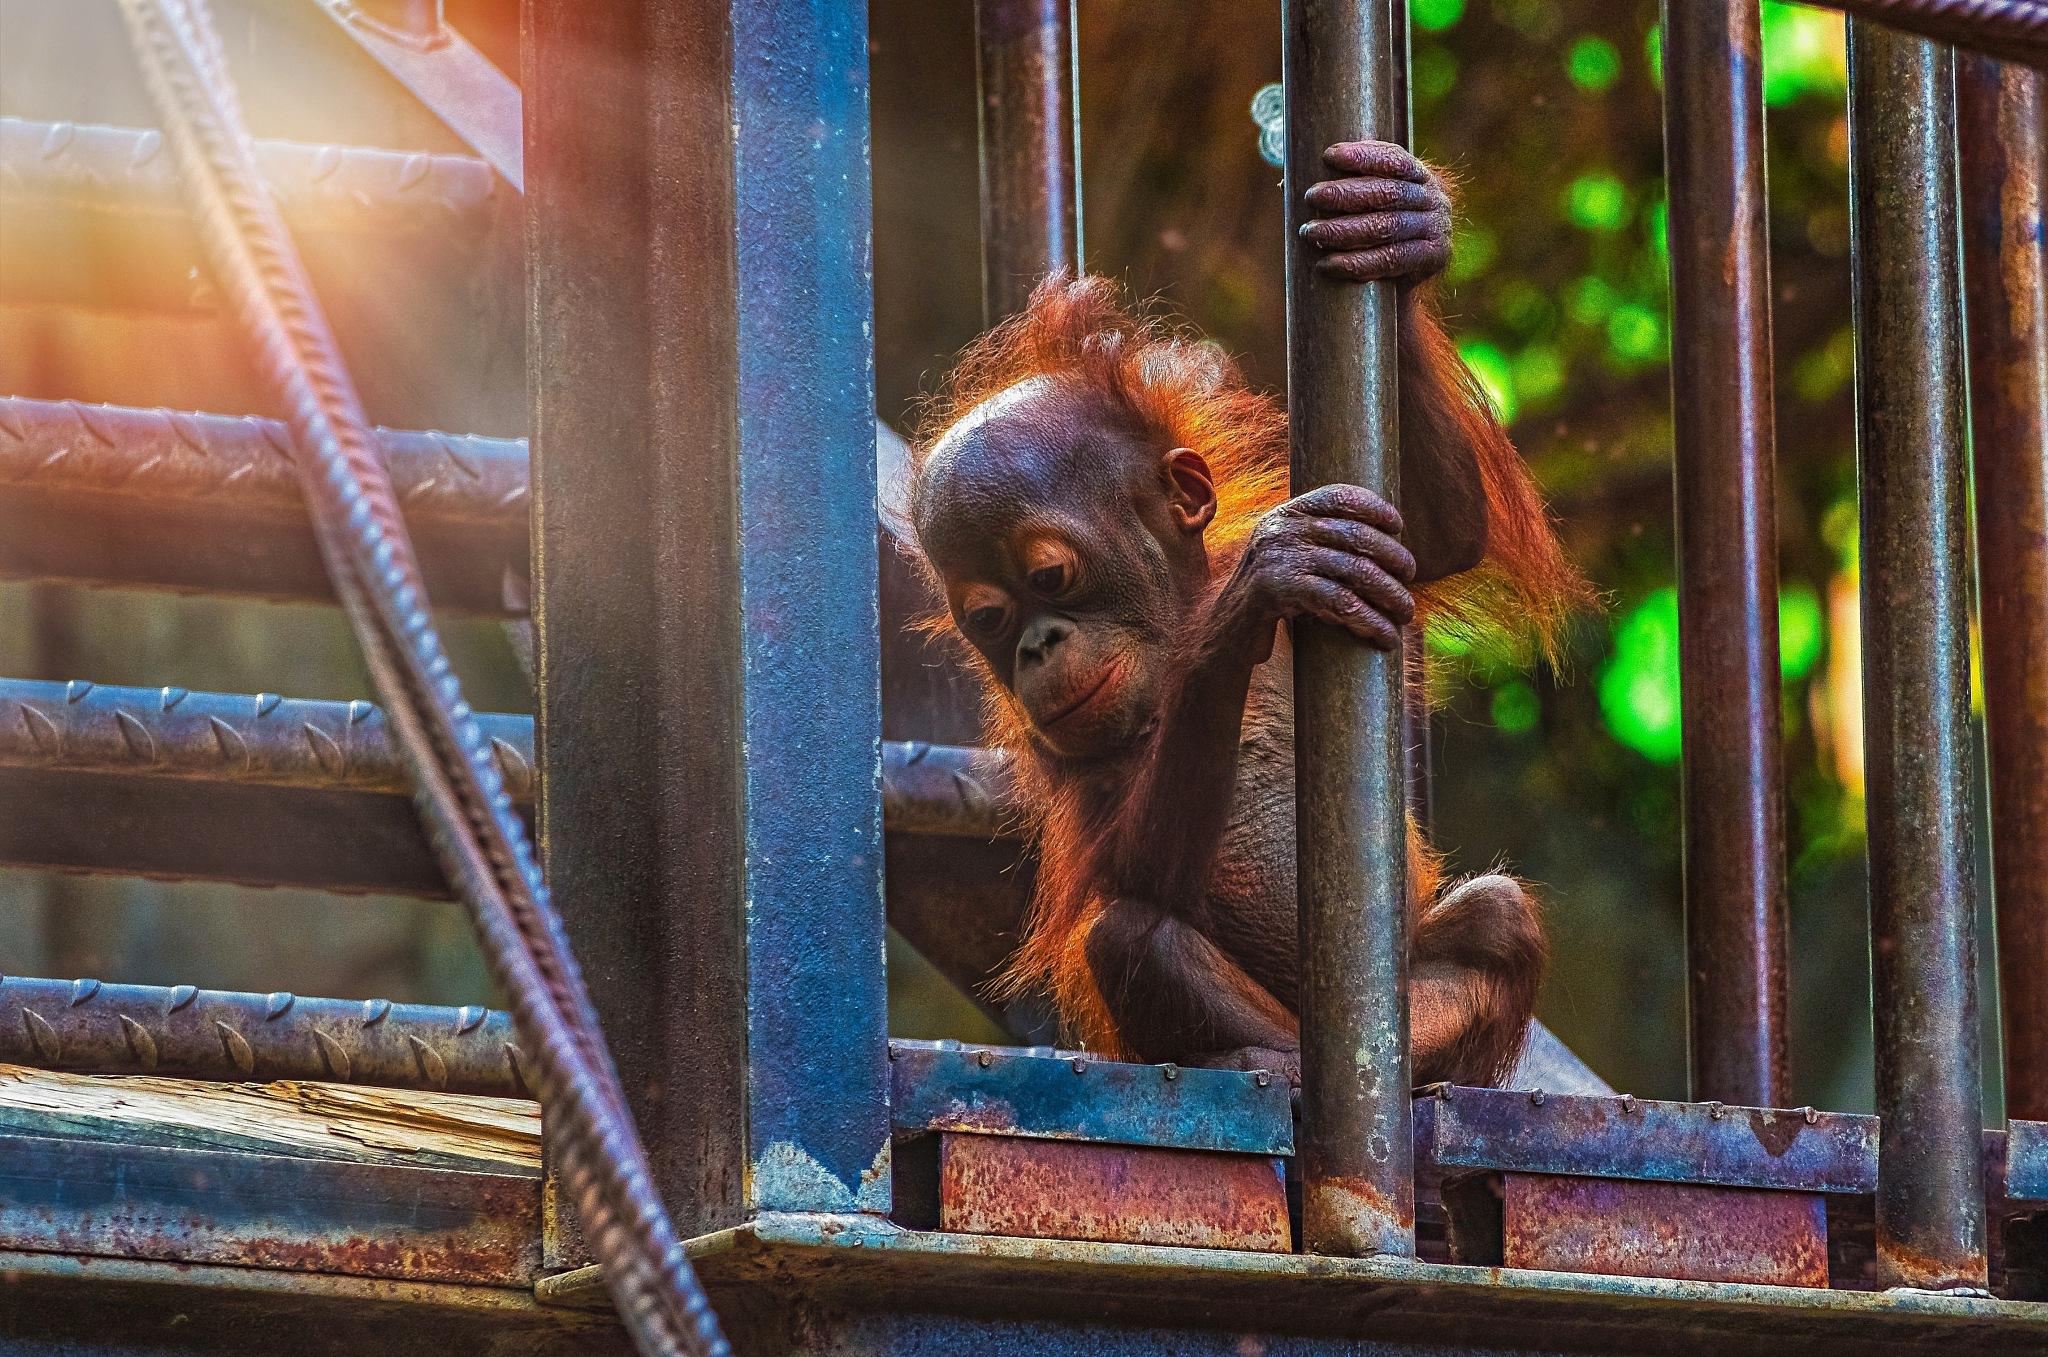 Orangutan Baby by Juan Sánchez